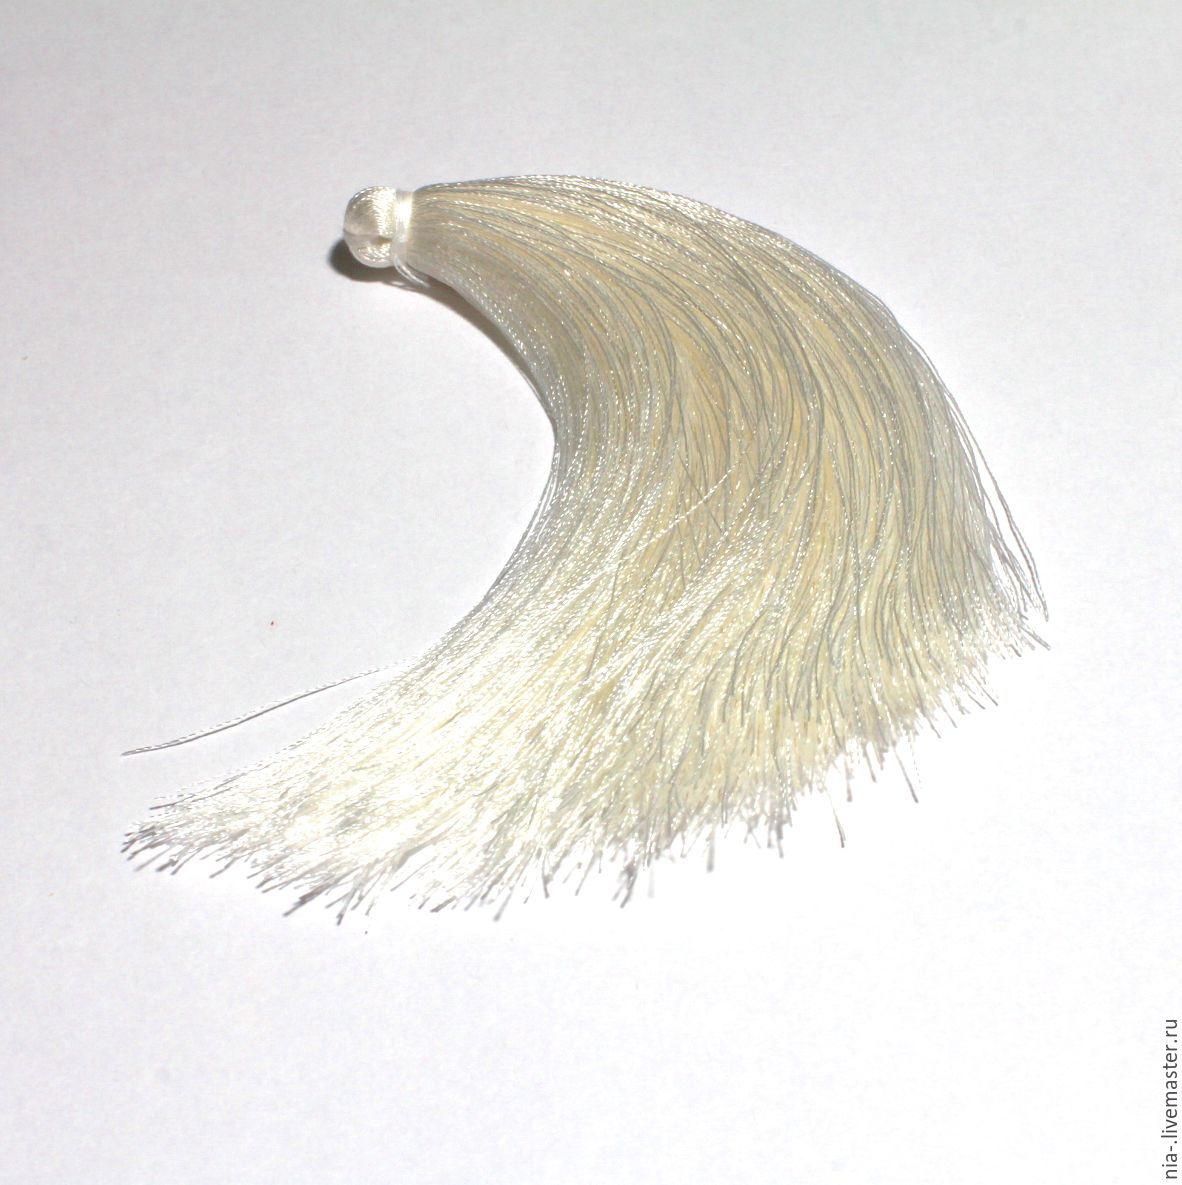 Кисти для украшений белые 12 см k223, Шнуры, Москва, Фото №1